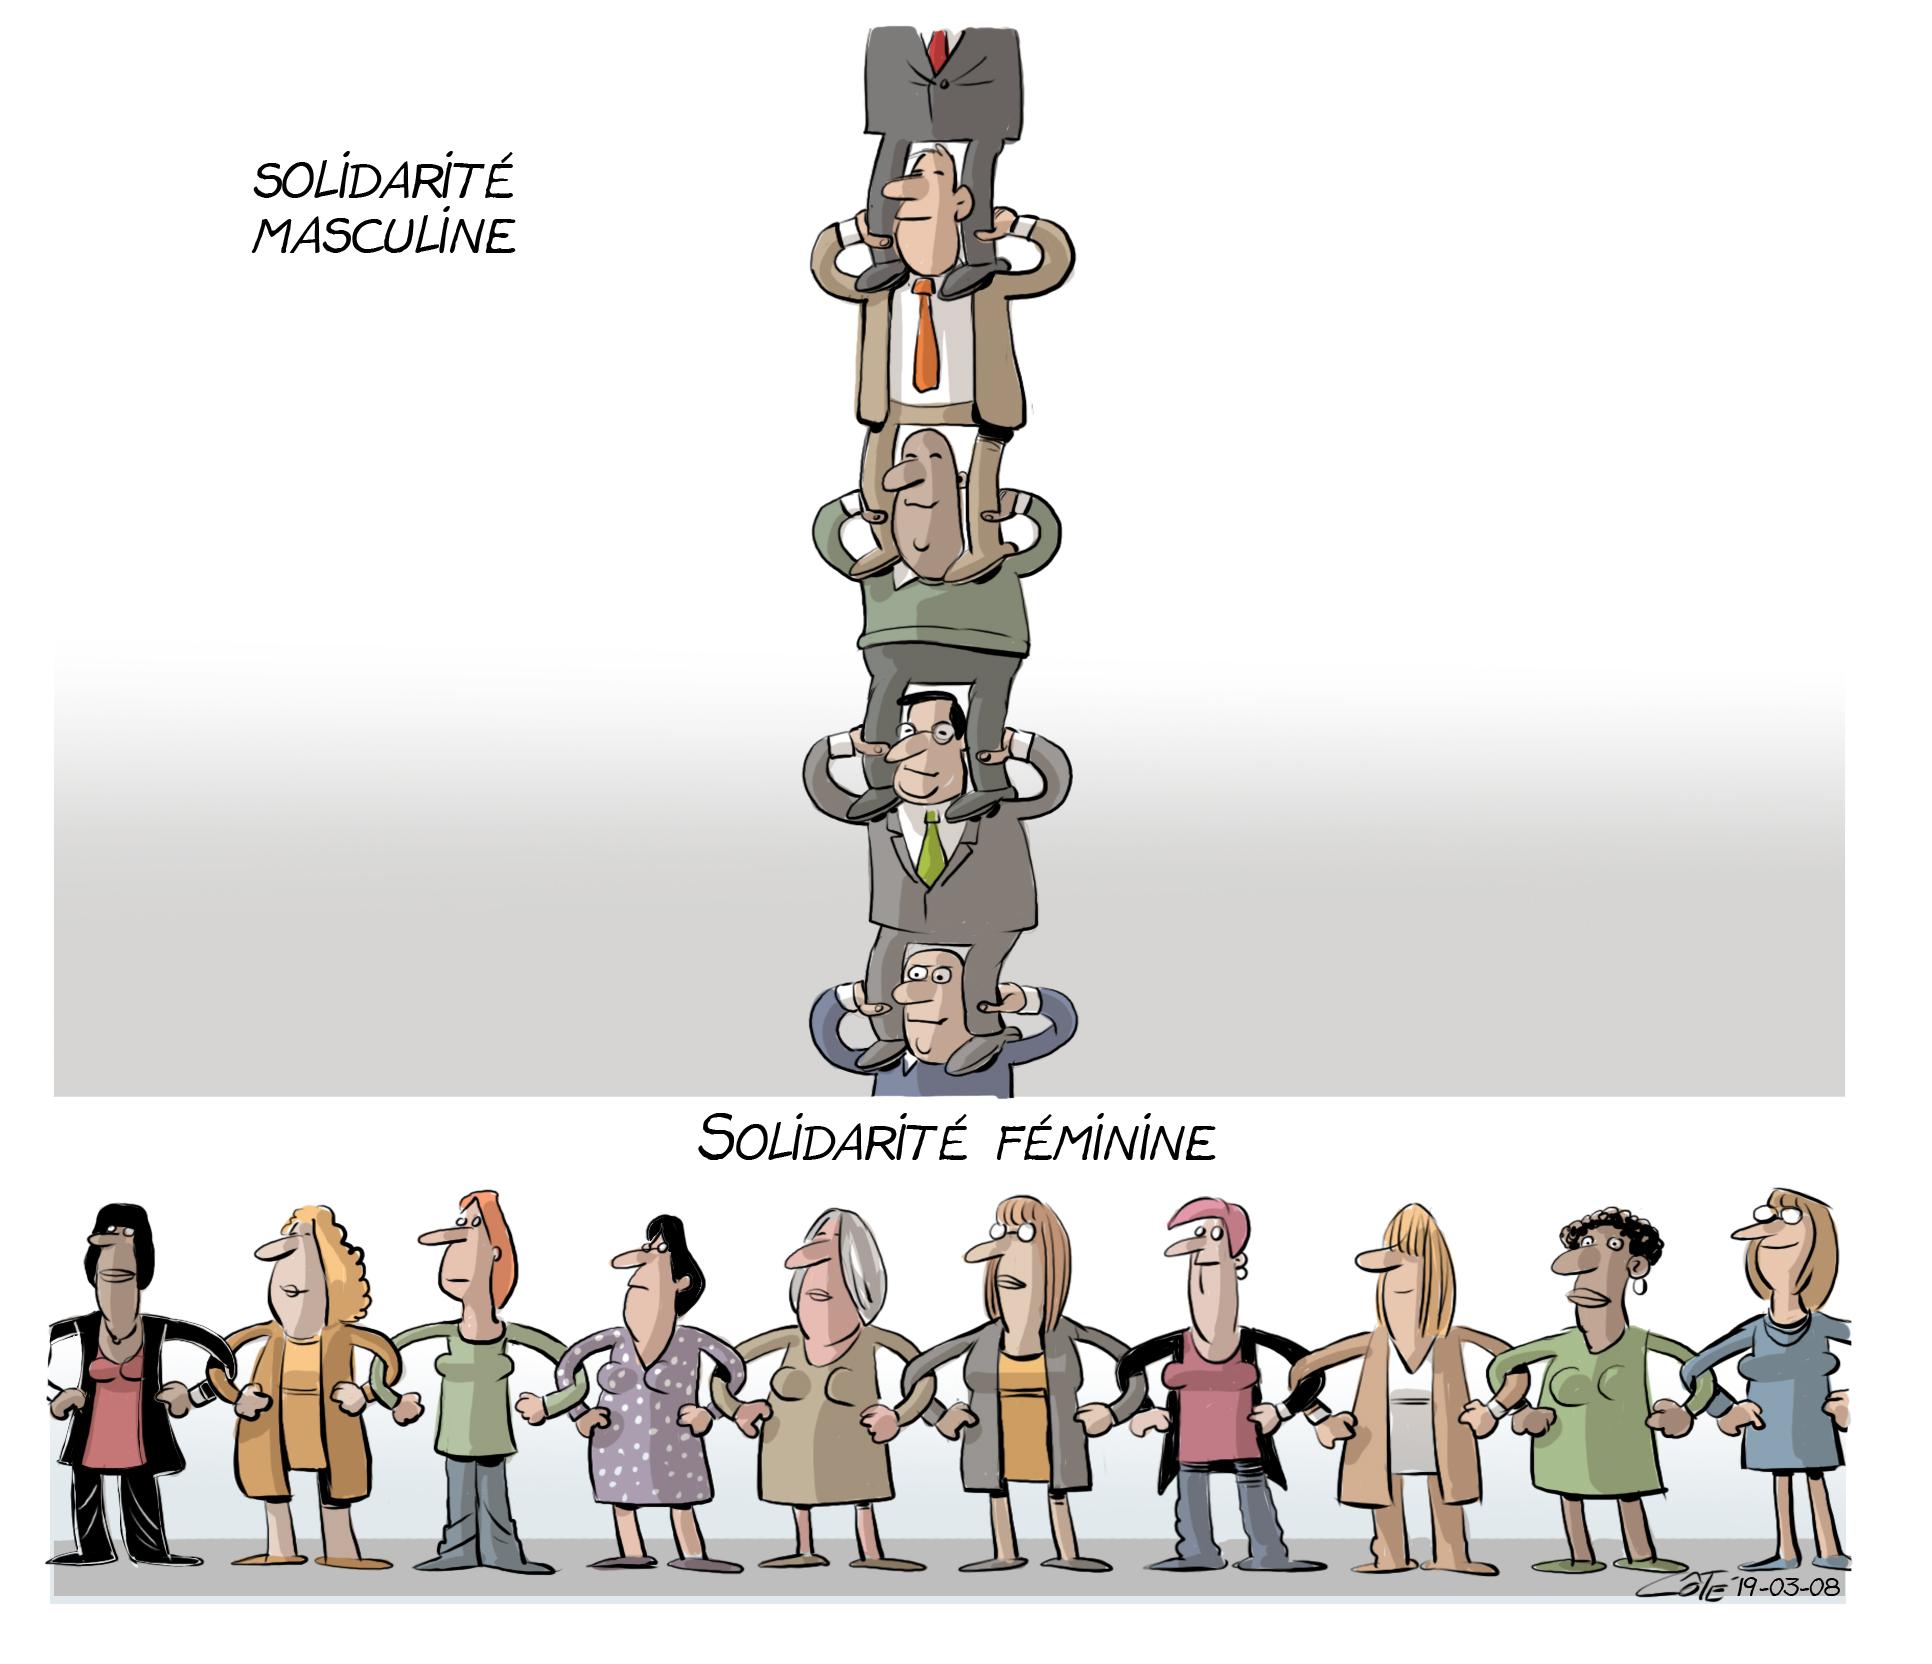 COTE (Canada) – Cartooning for Peace